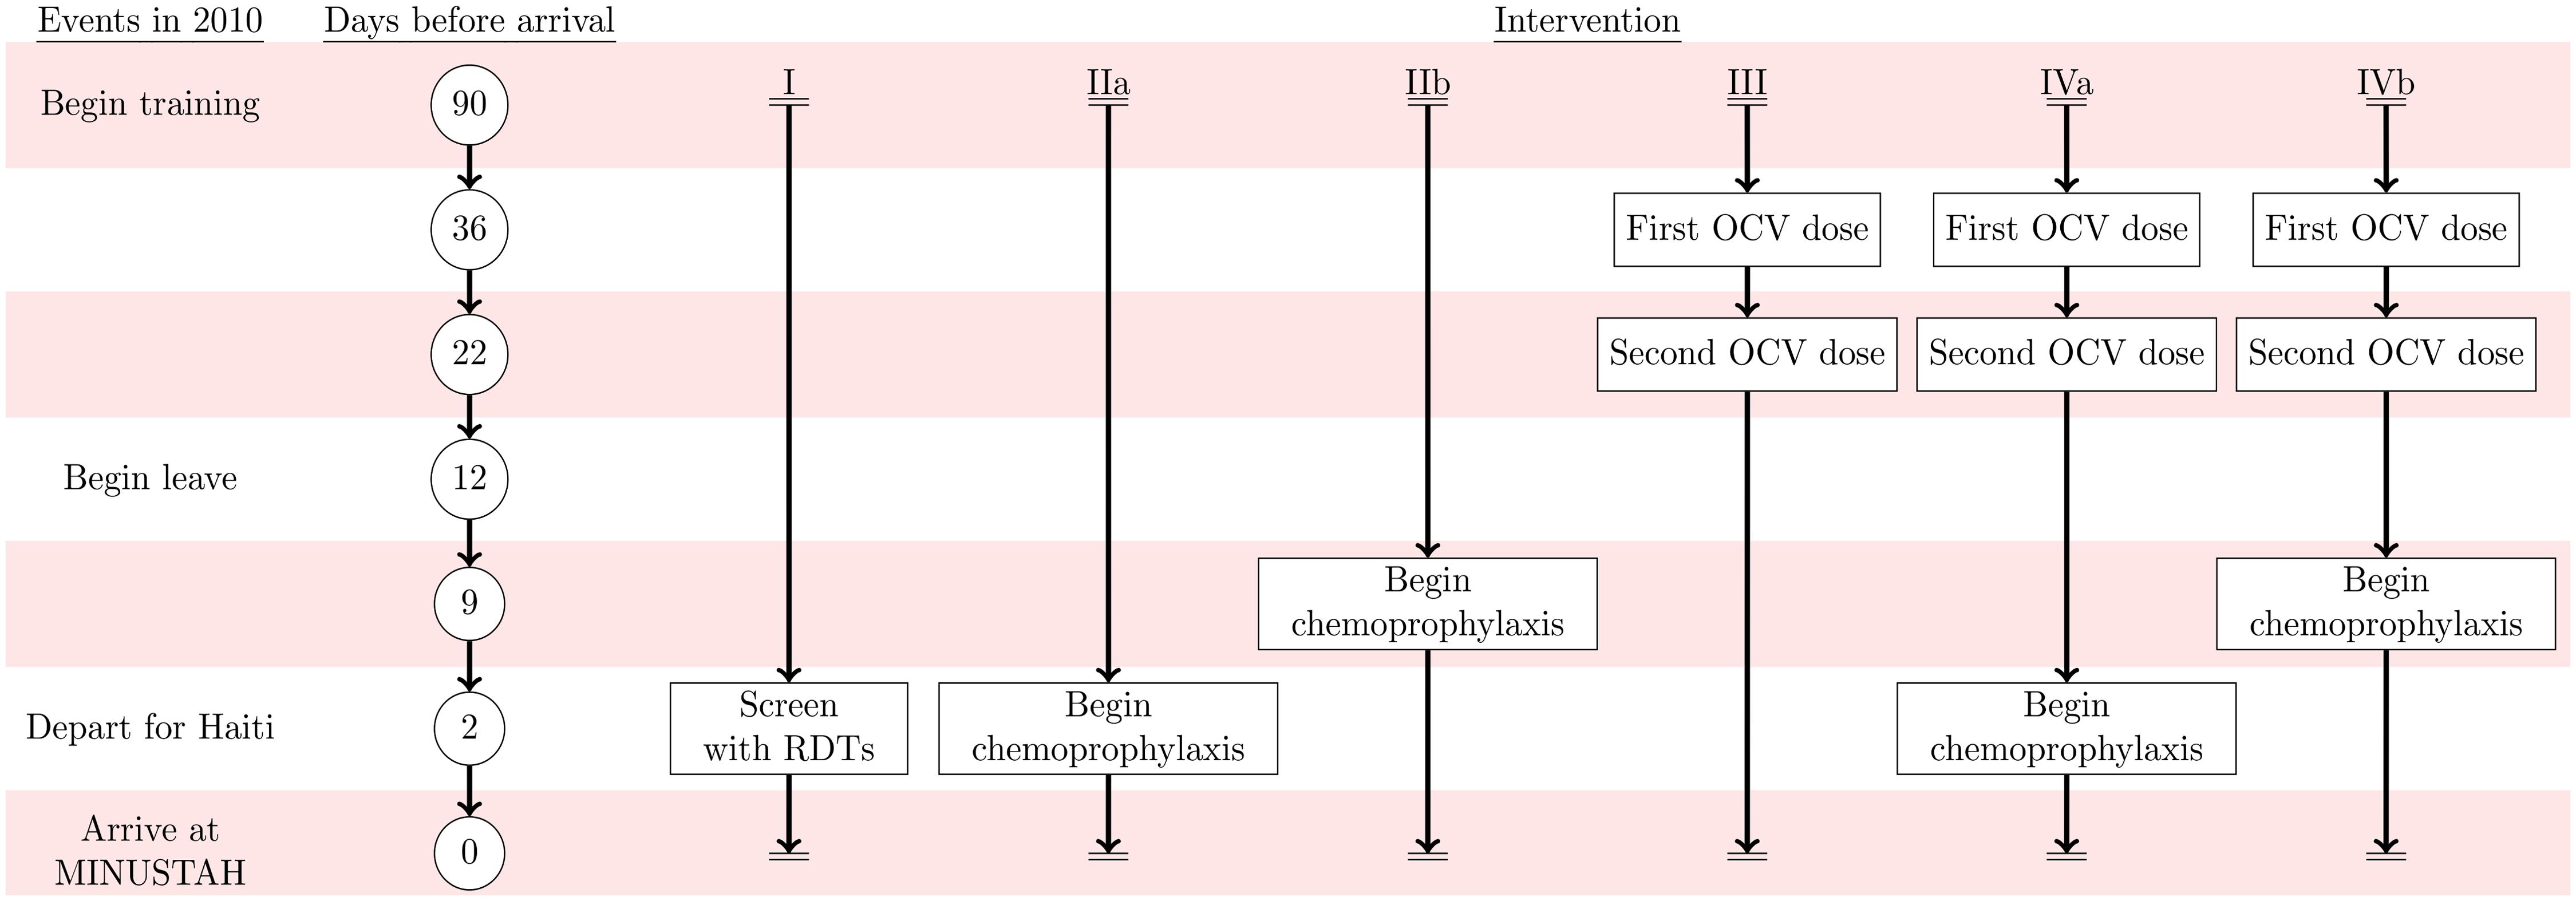 Intervention timeline.